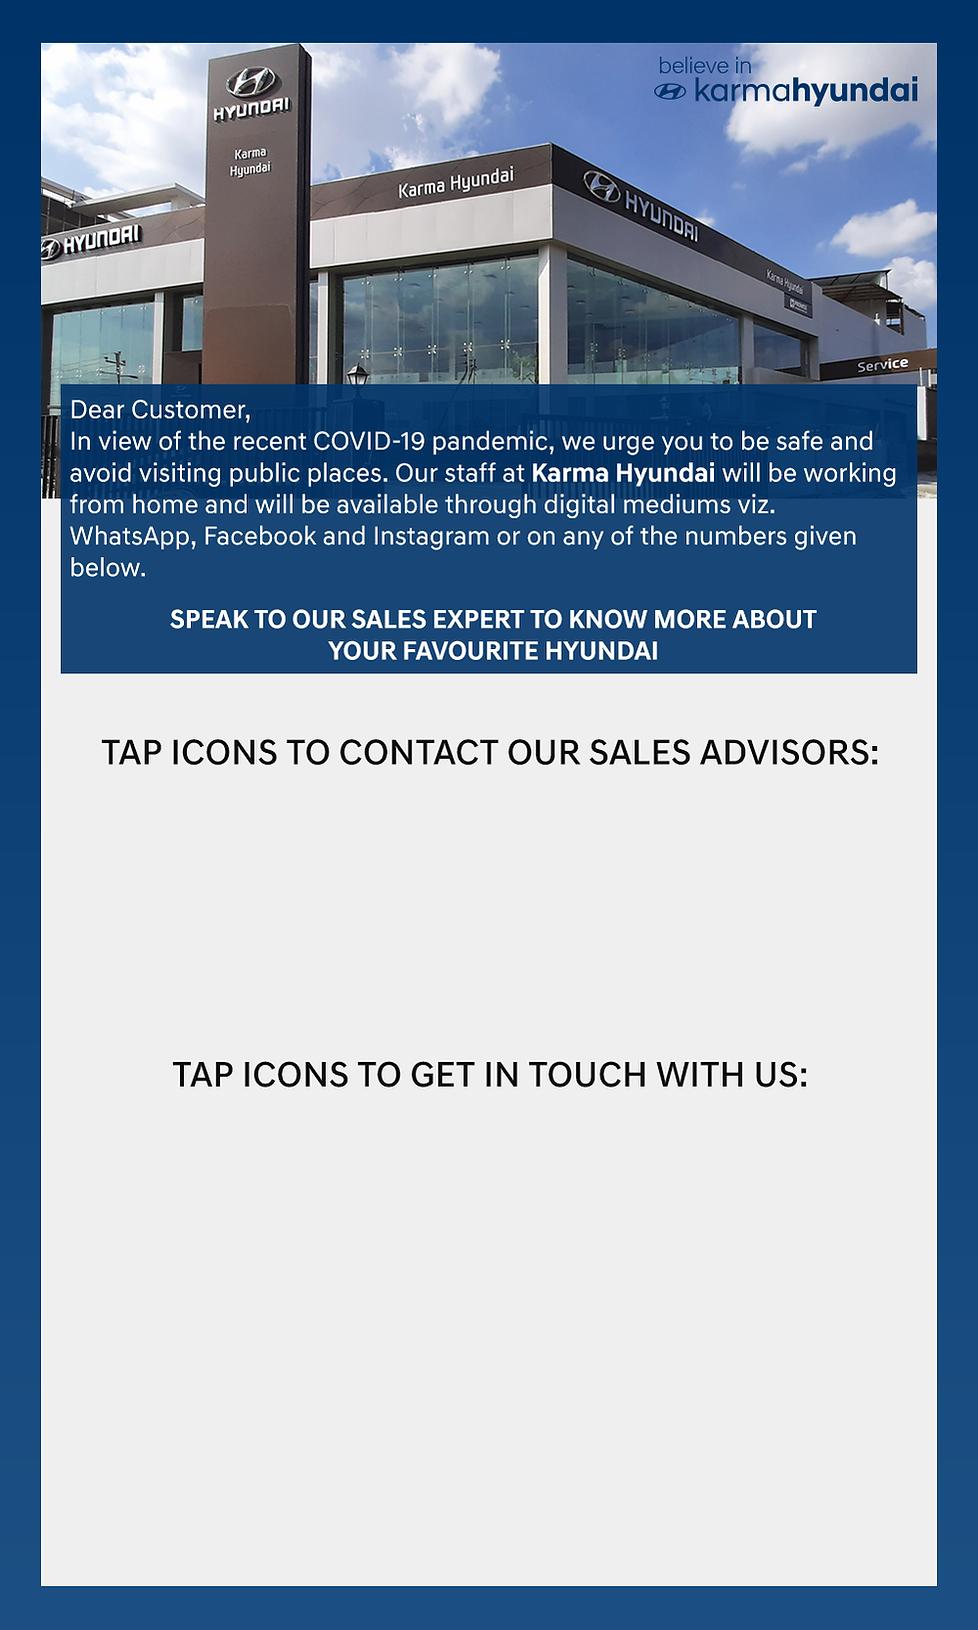 karma-hyundai-sales-contact.png